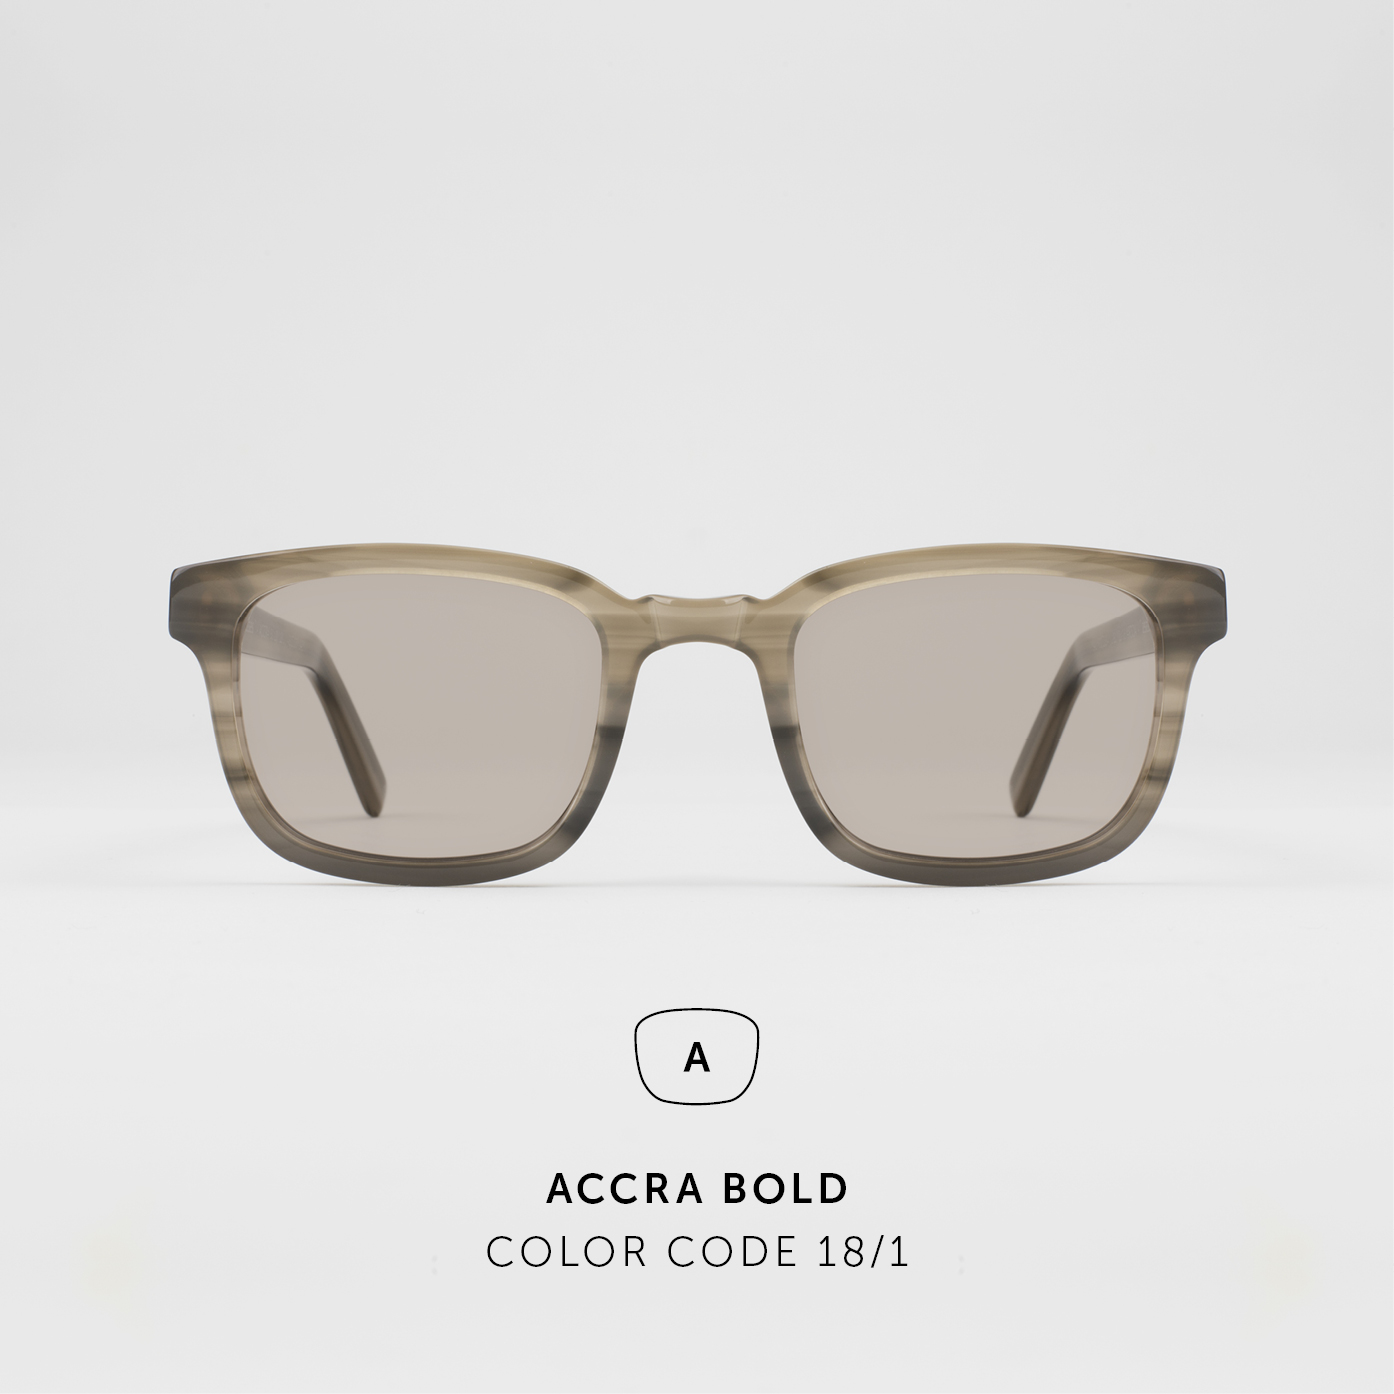 AccraBold52.jpg